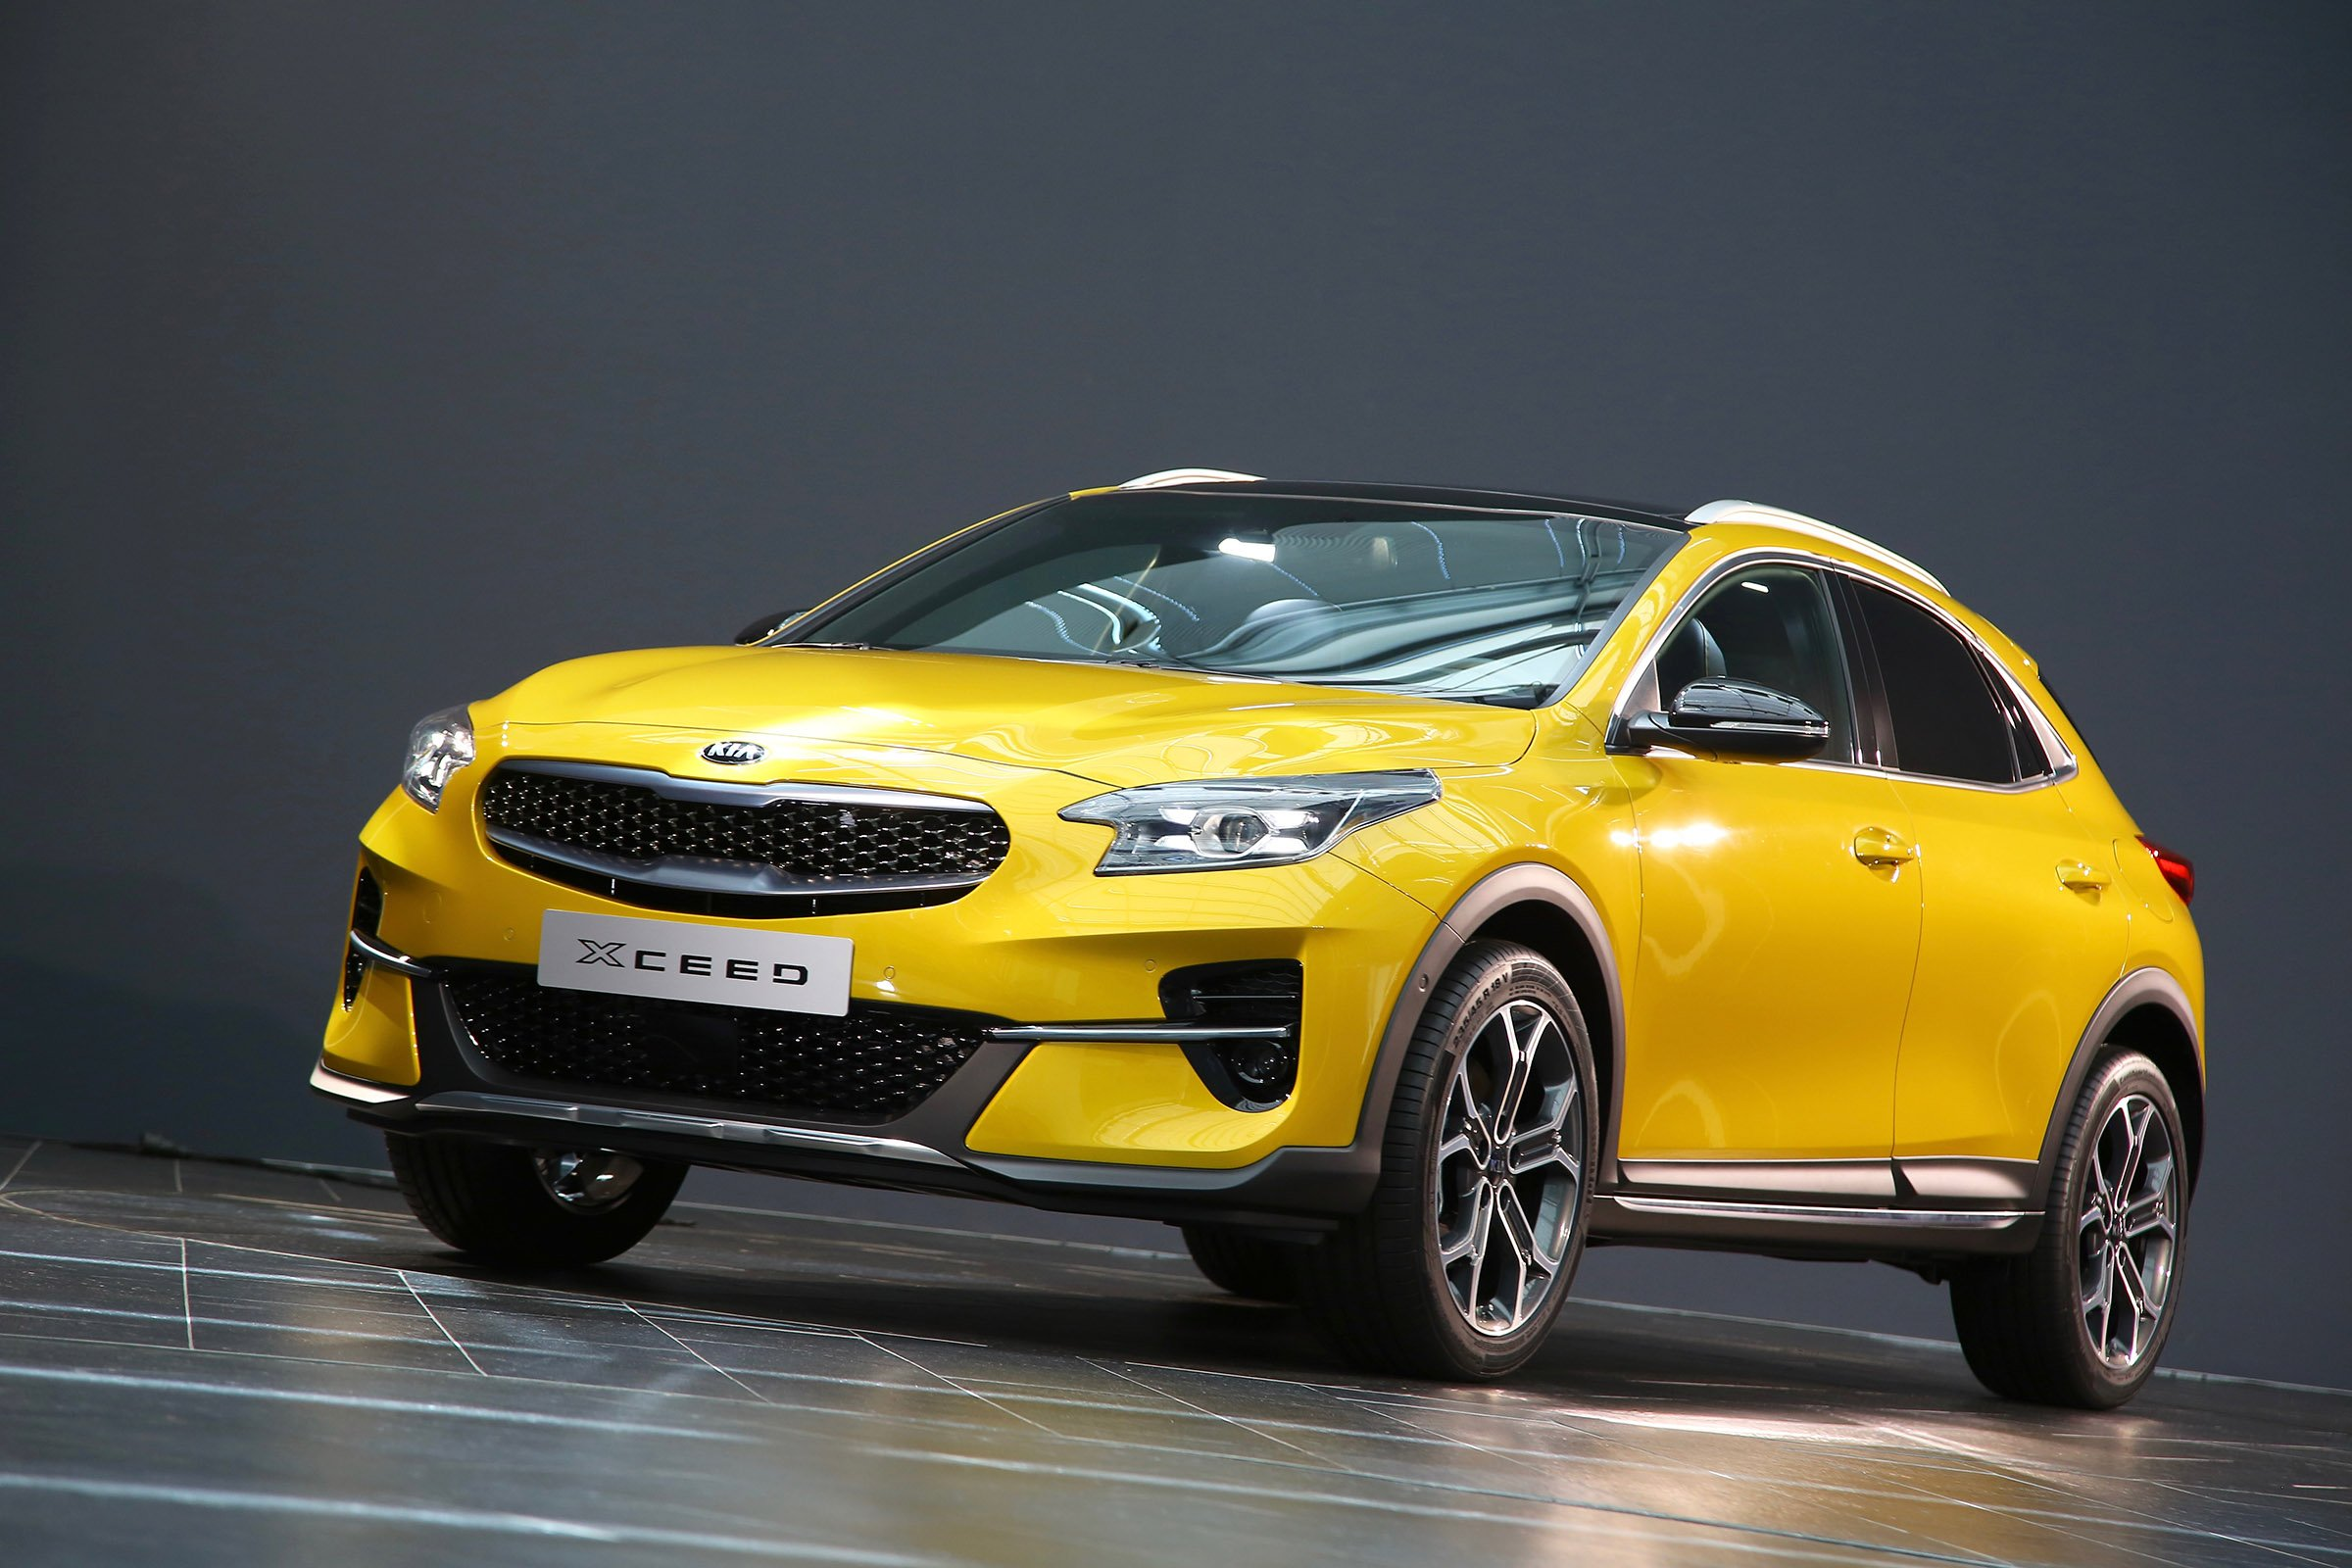 2021 Kia Ceed Xceed 1.6 CRDi Prestige Design DCT